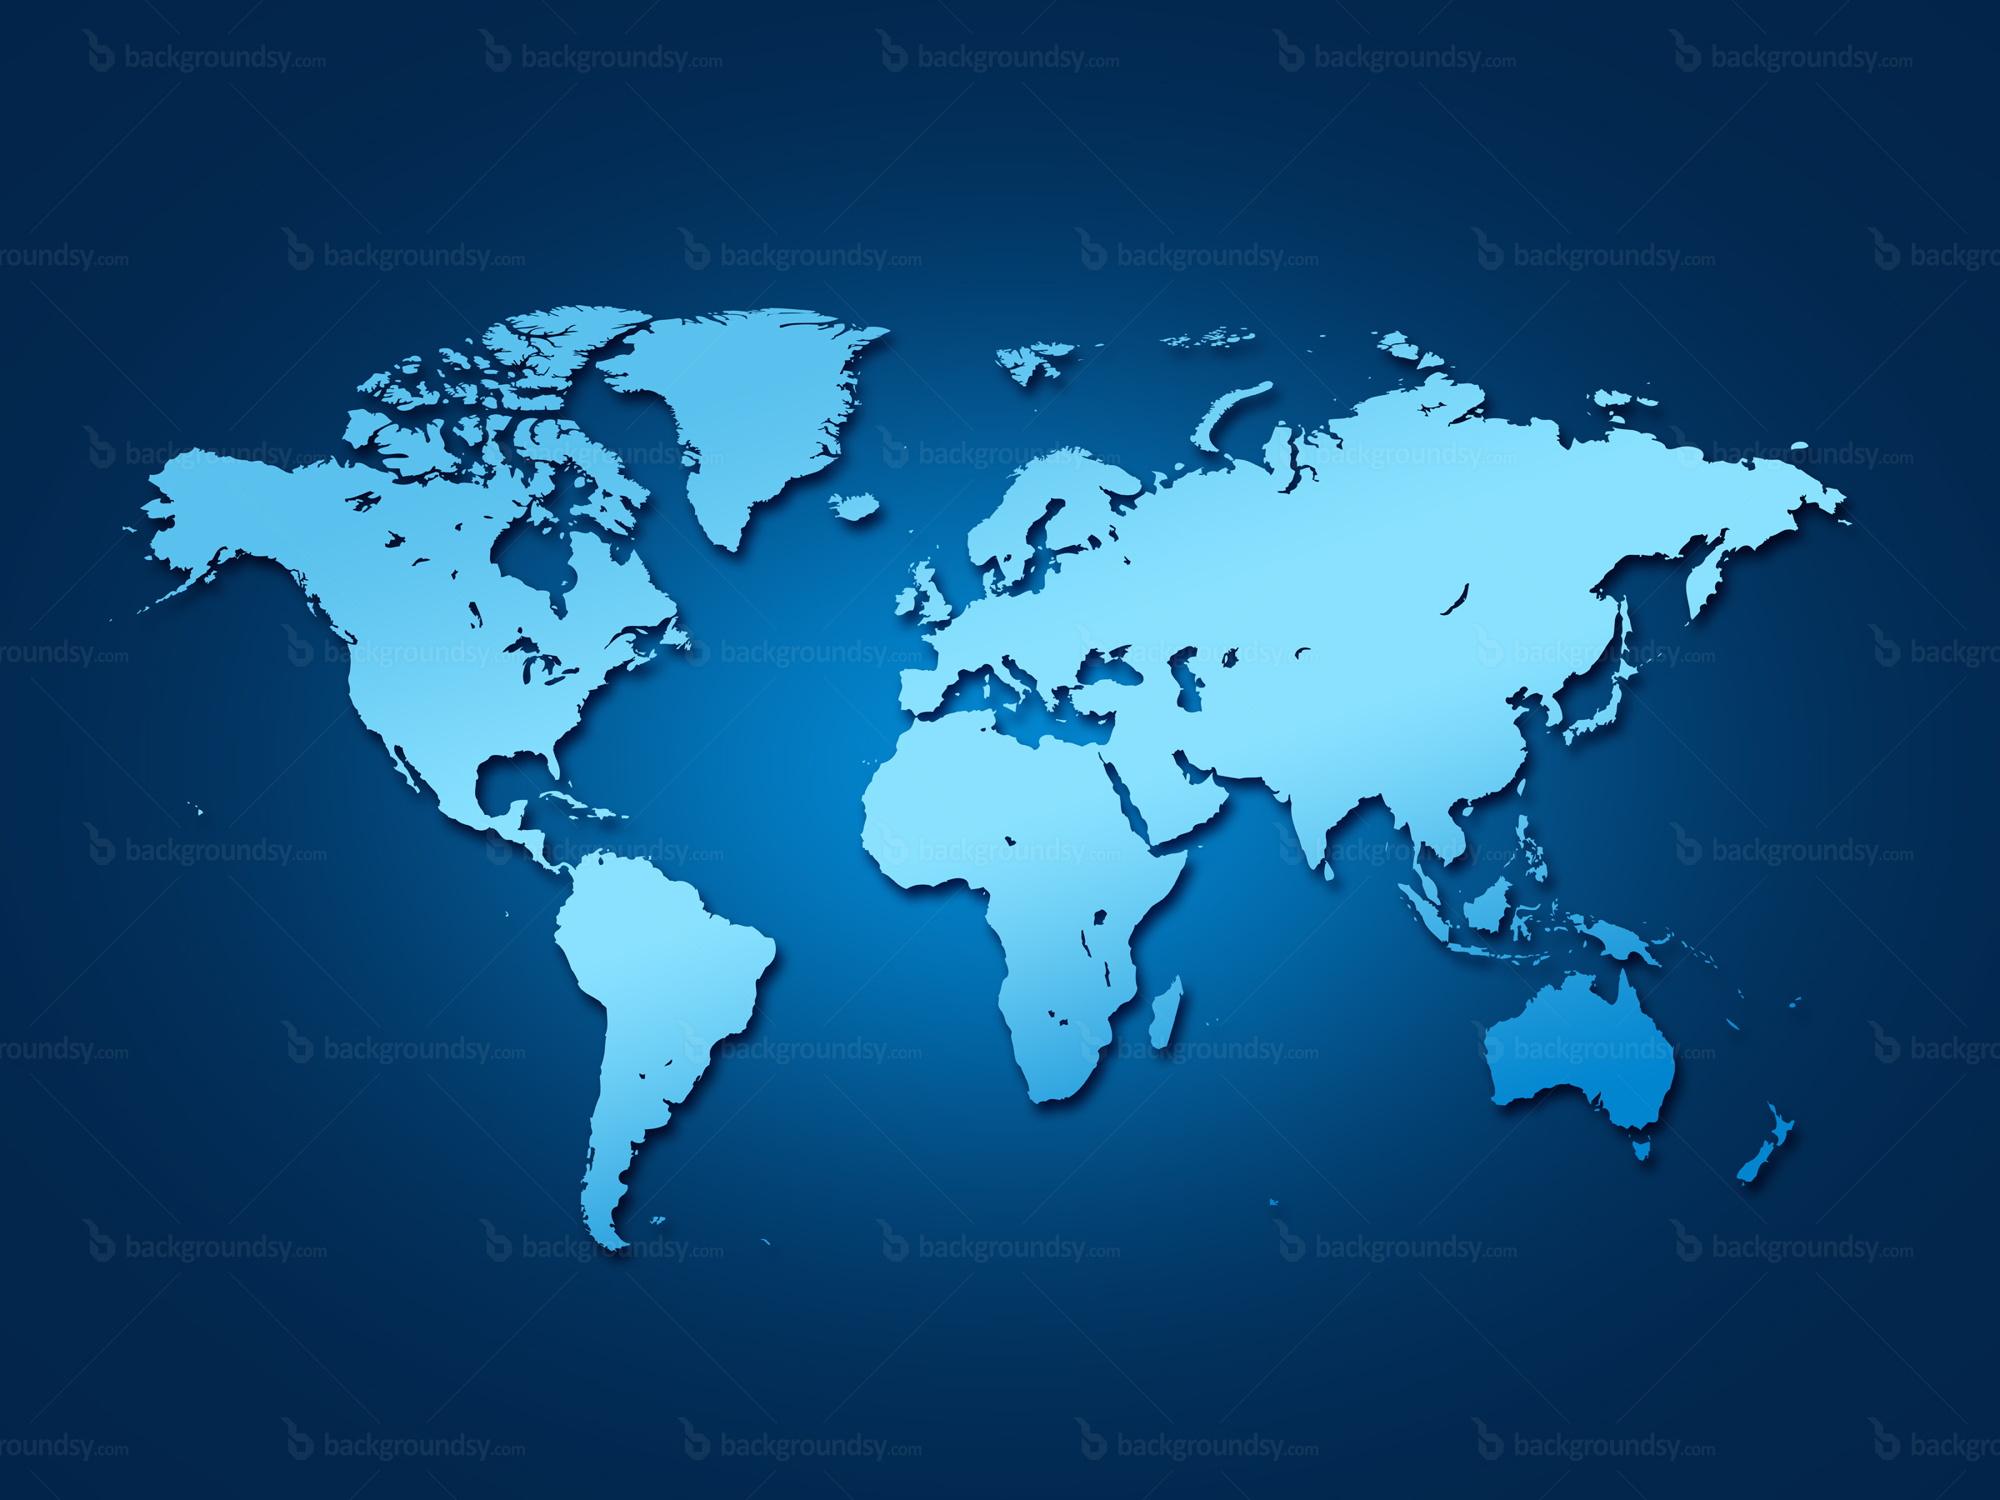 Blue world map | Backgroundsy.com